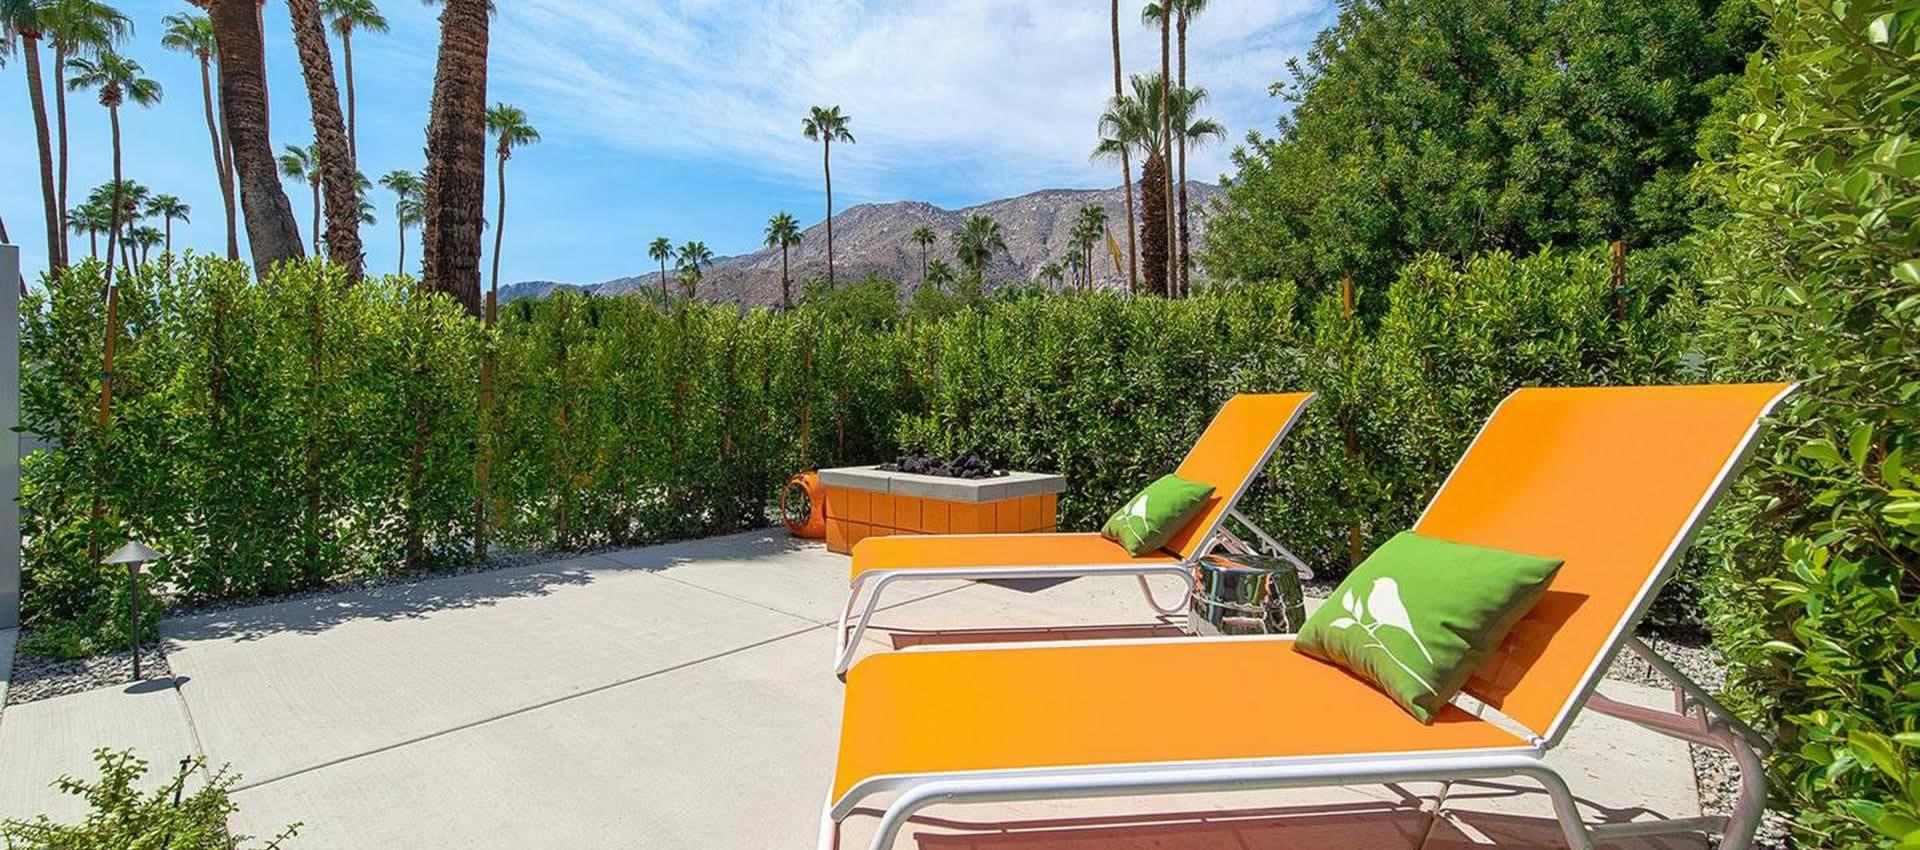 twist-hotel-room107-patio-chairs